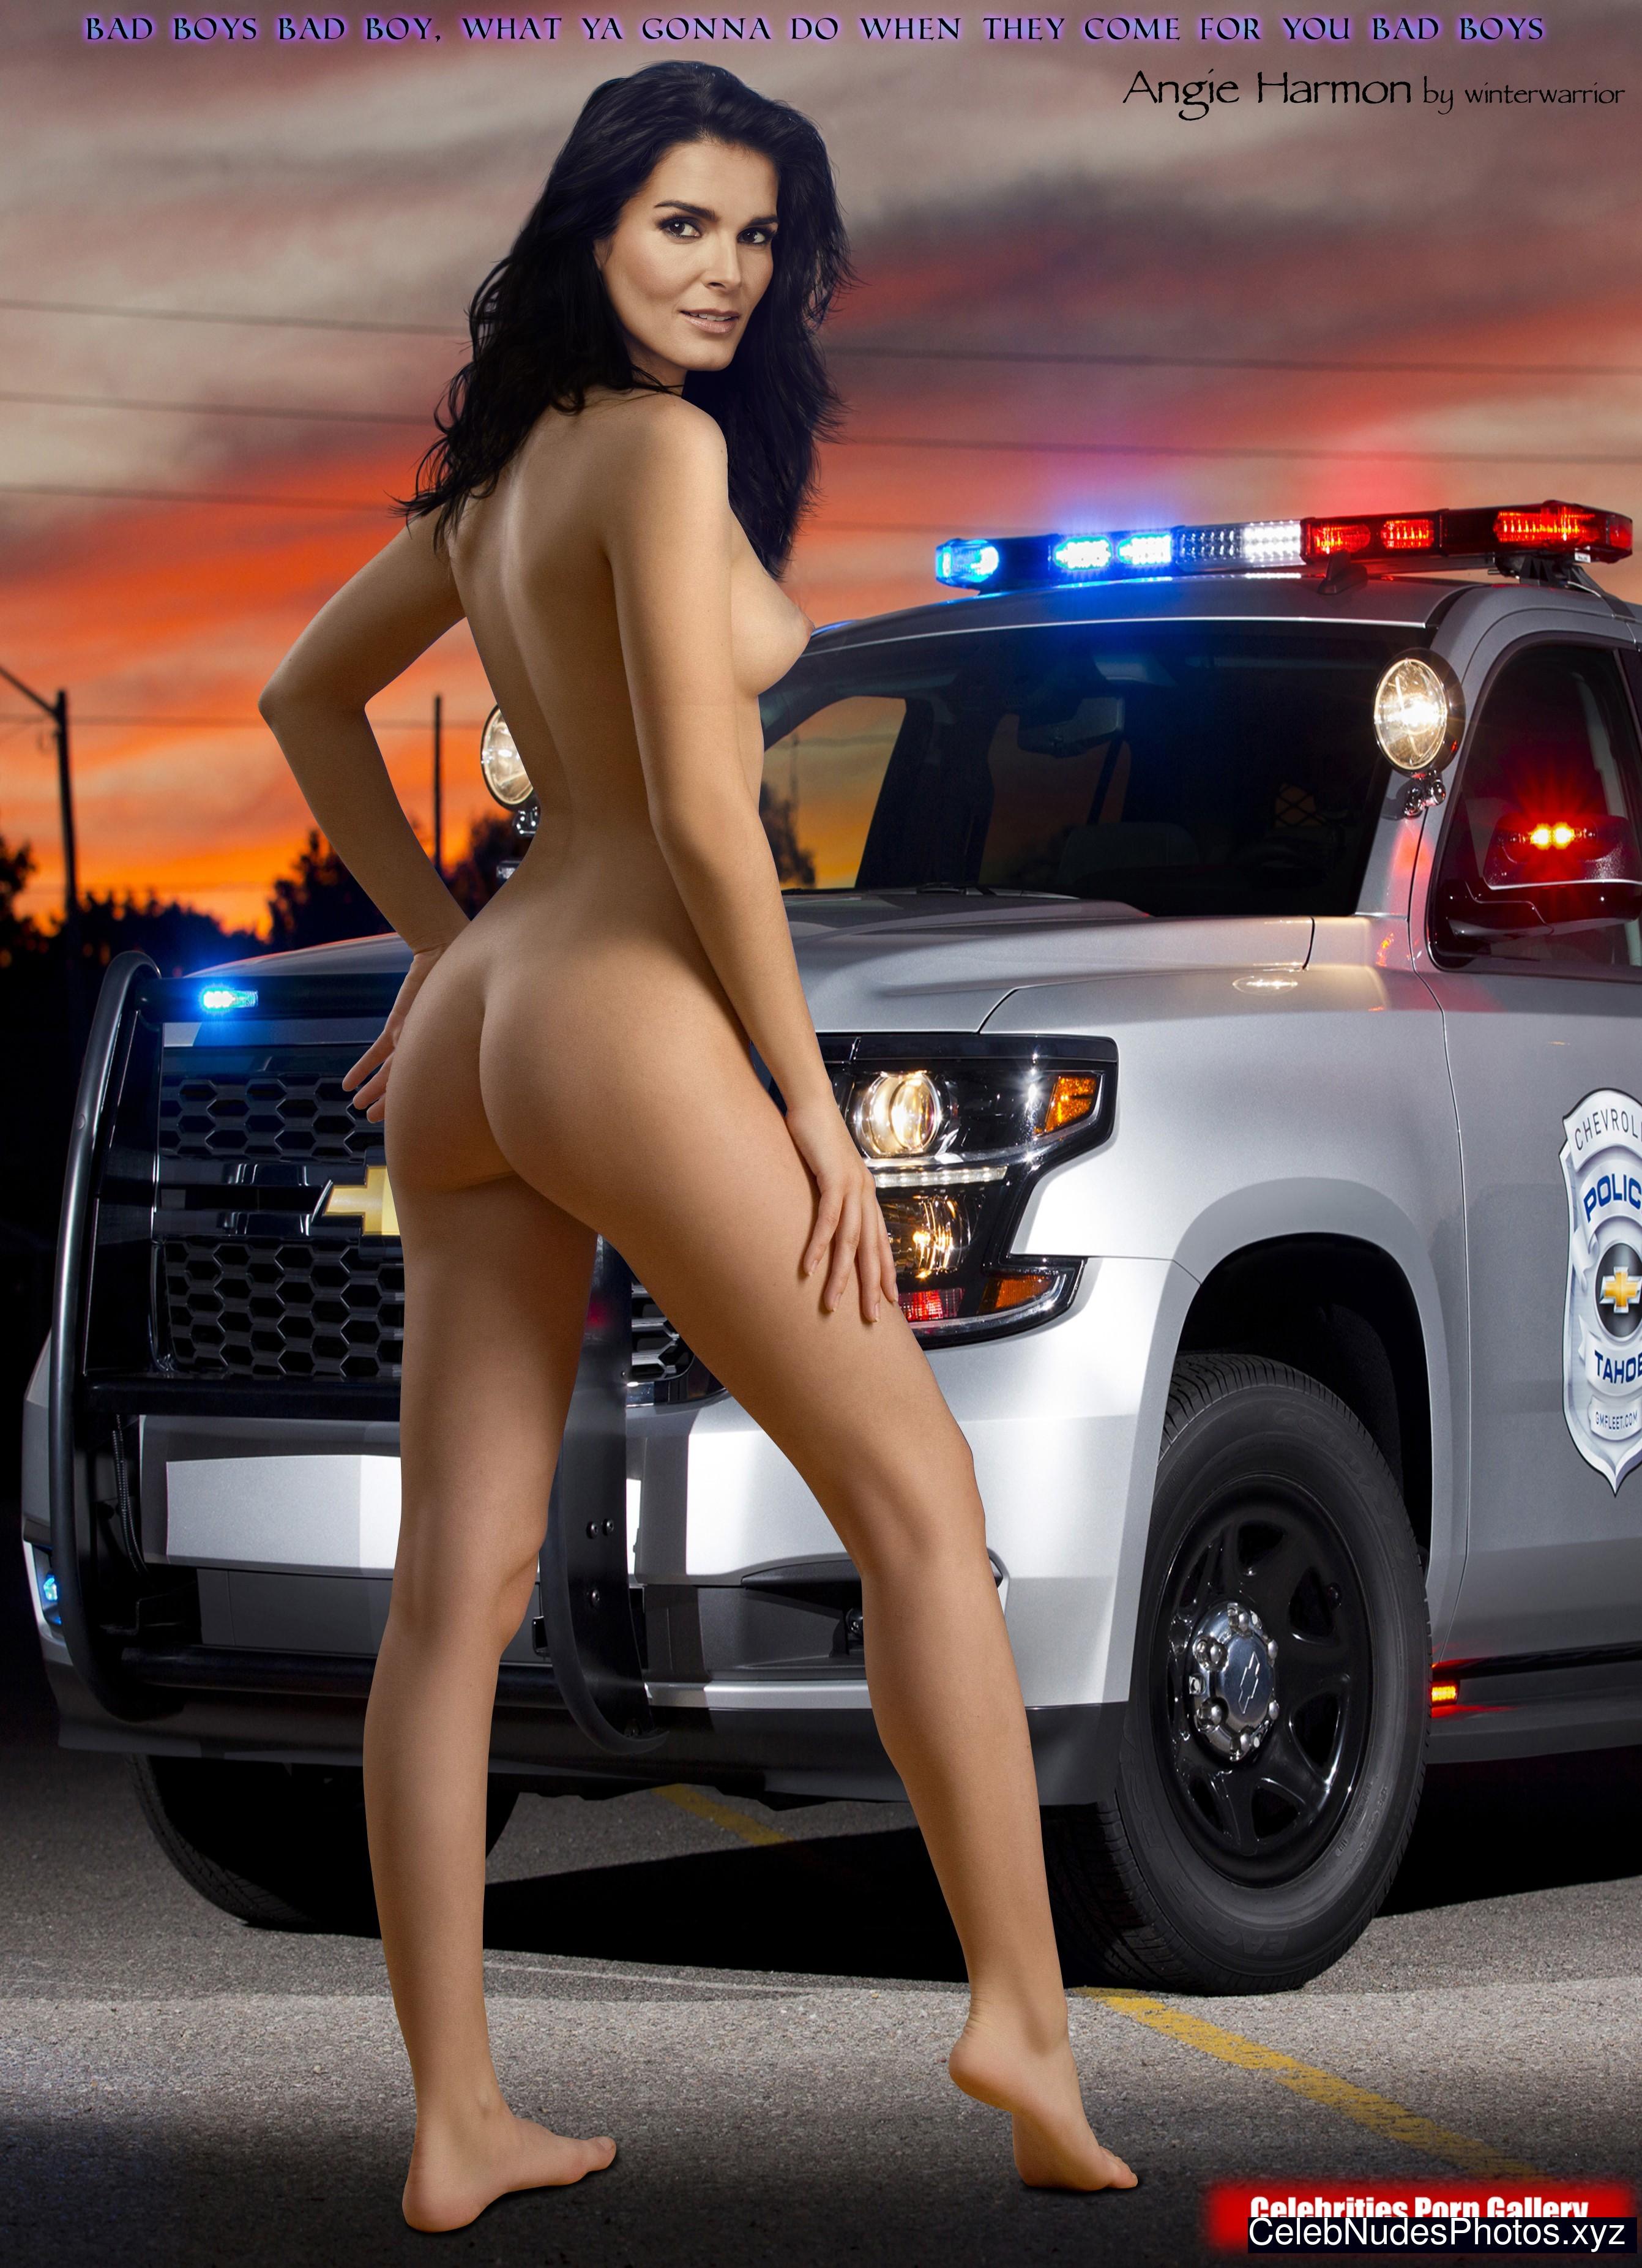 Angie Harmon Xnxx nude angie harmon hot - porn archive